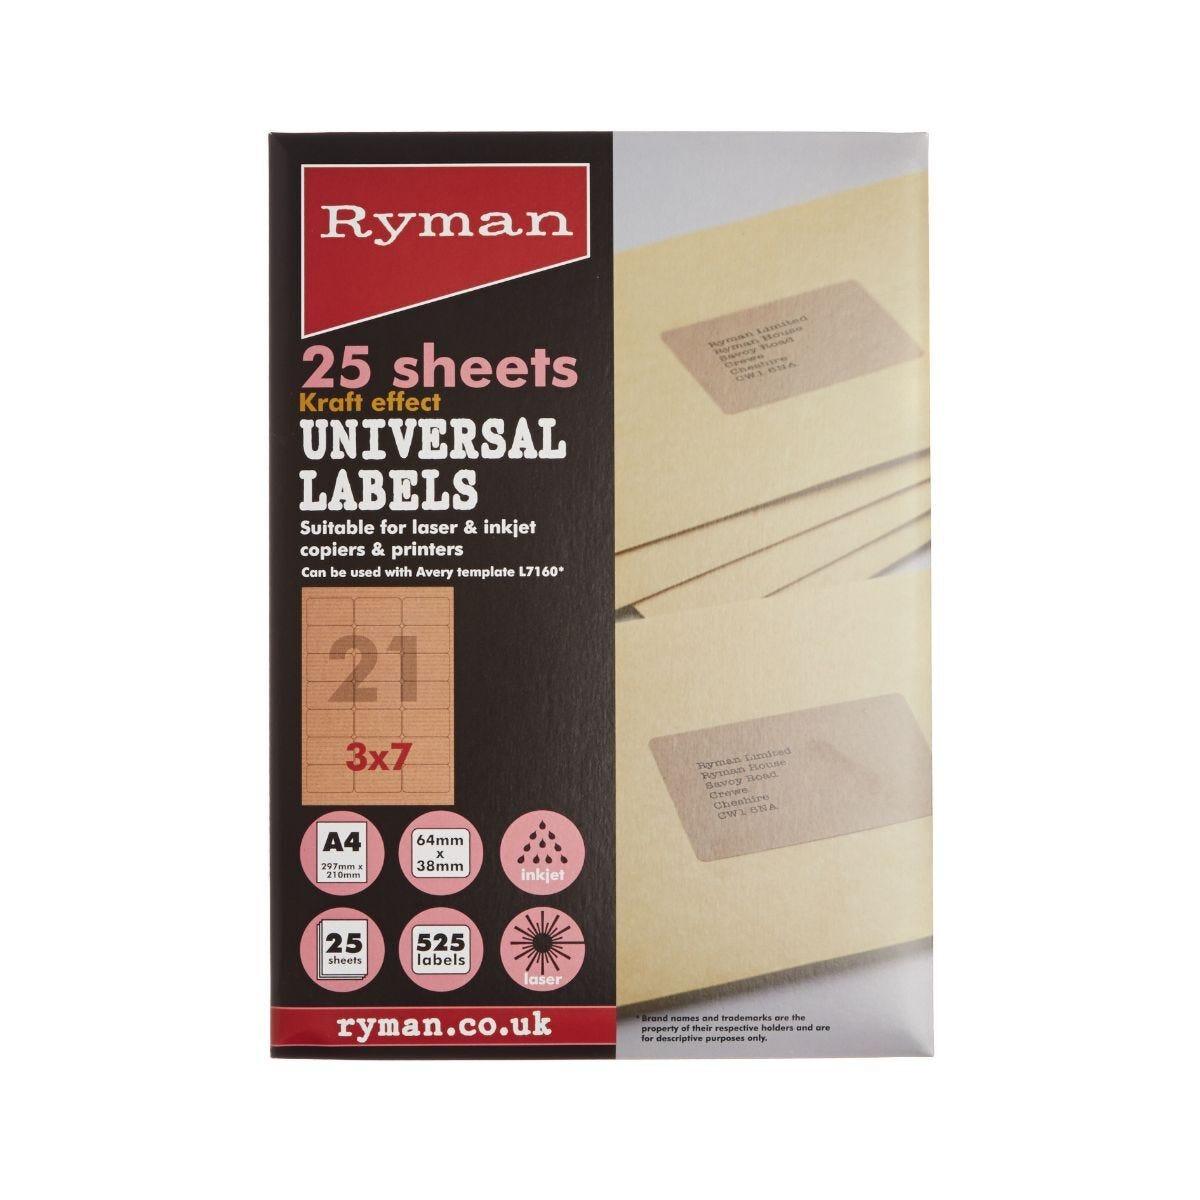 Ryman Universal Labels 21 Per Sheet Pack of 25 Sheets Brown